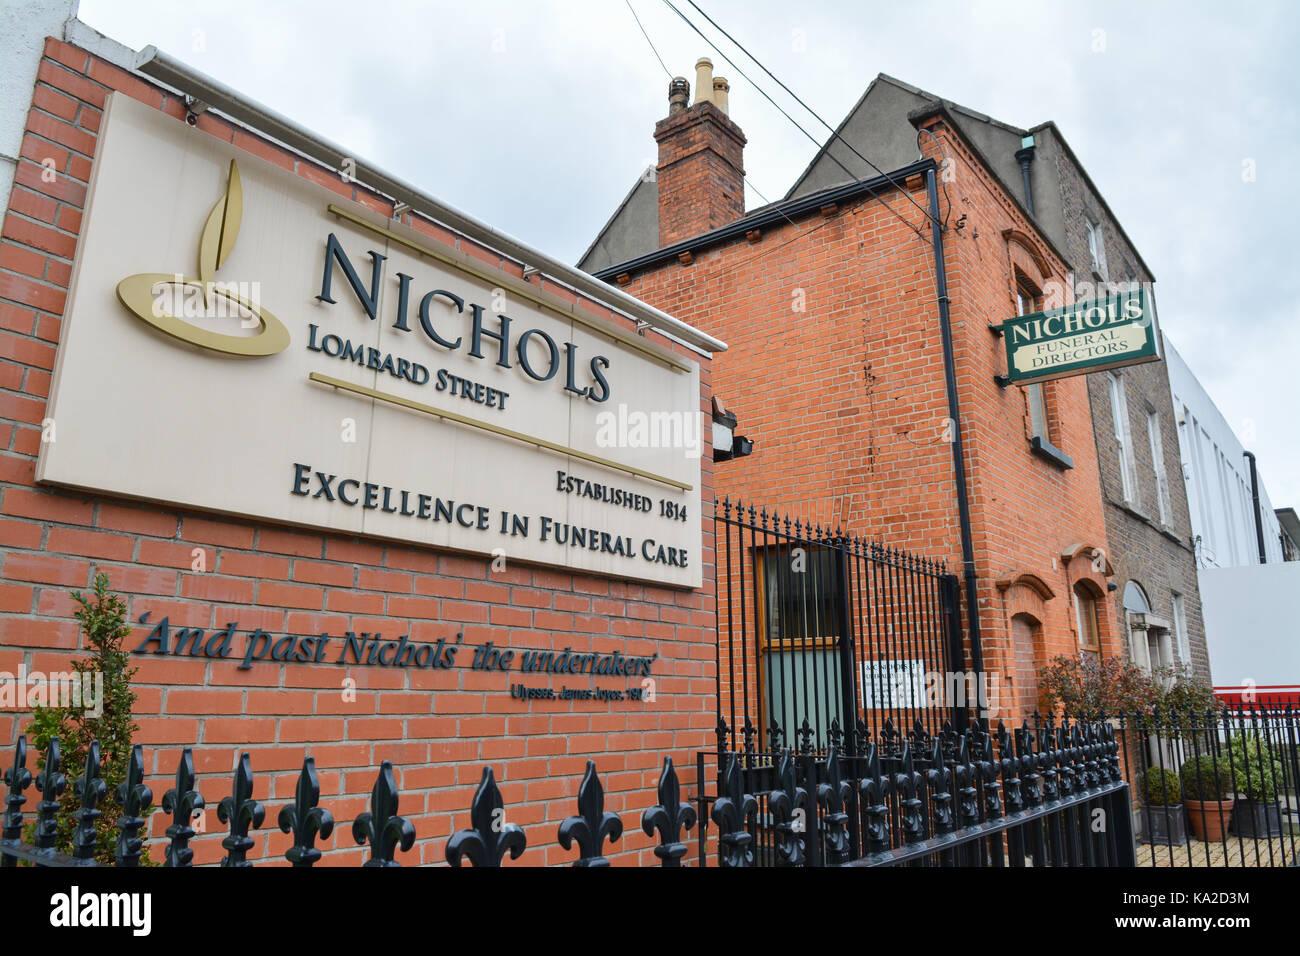 Nichols funeral directors, Dublin, Ireland - Stock Image